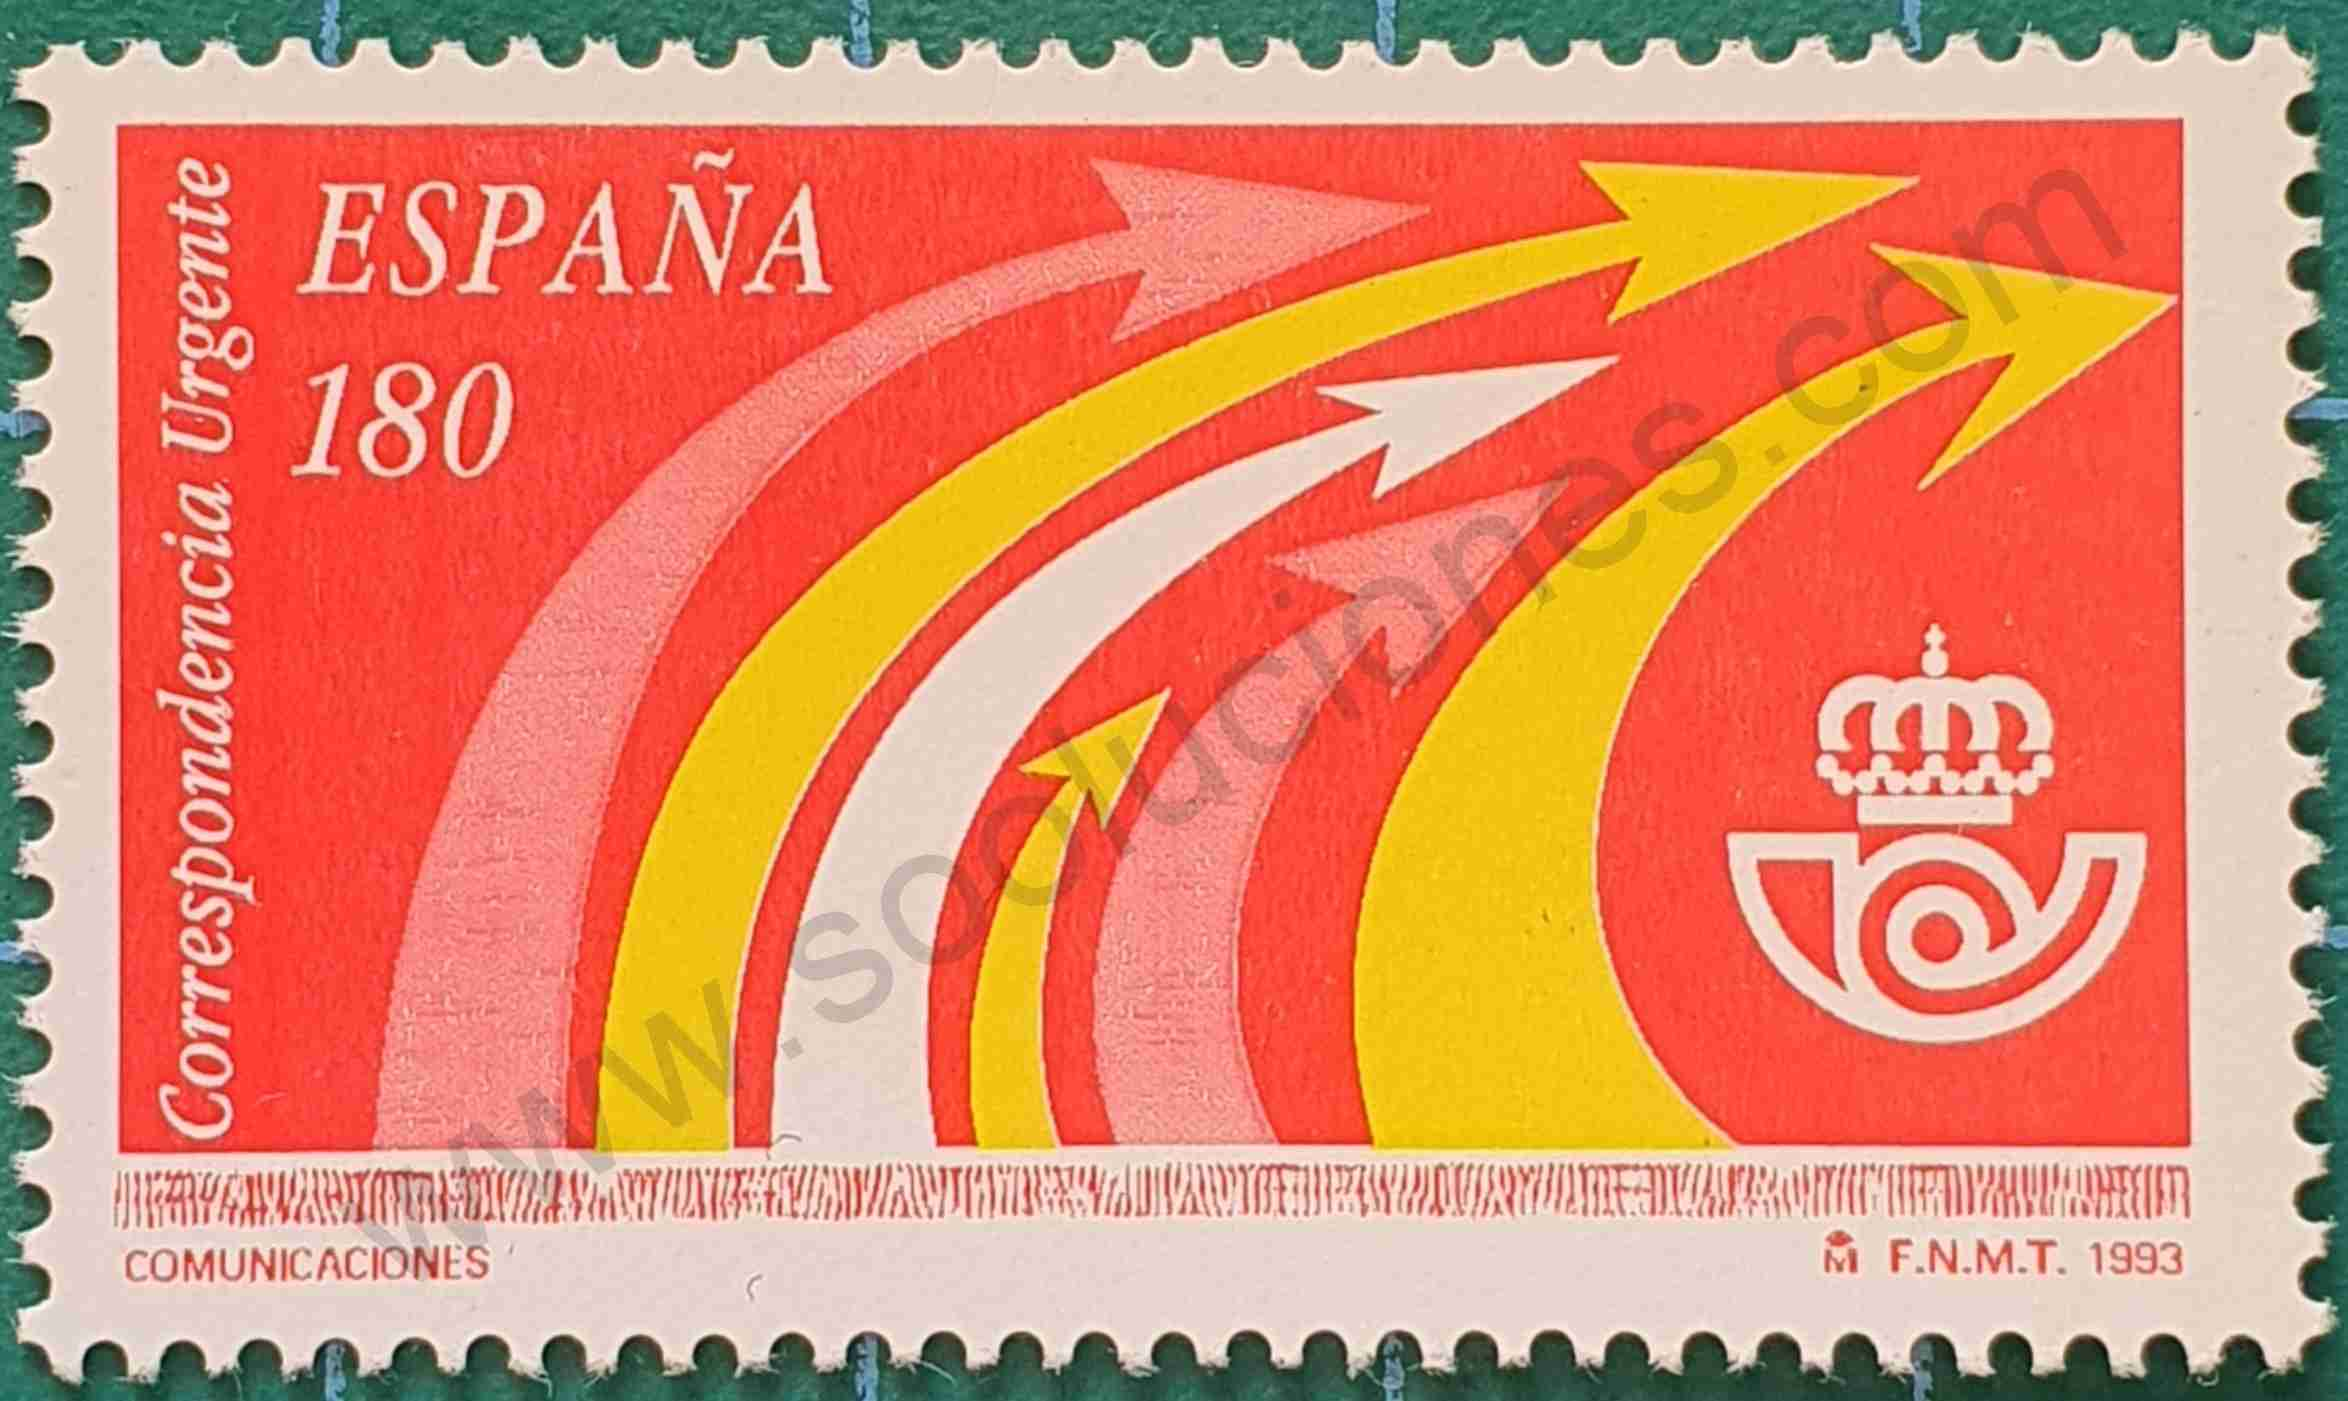 Comunicaciones - Sello España 1993